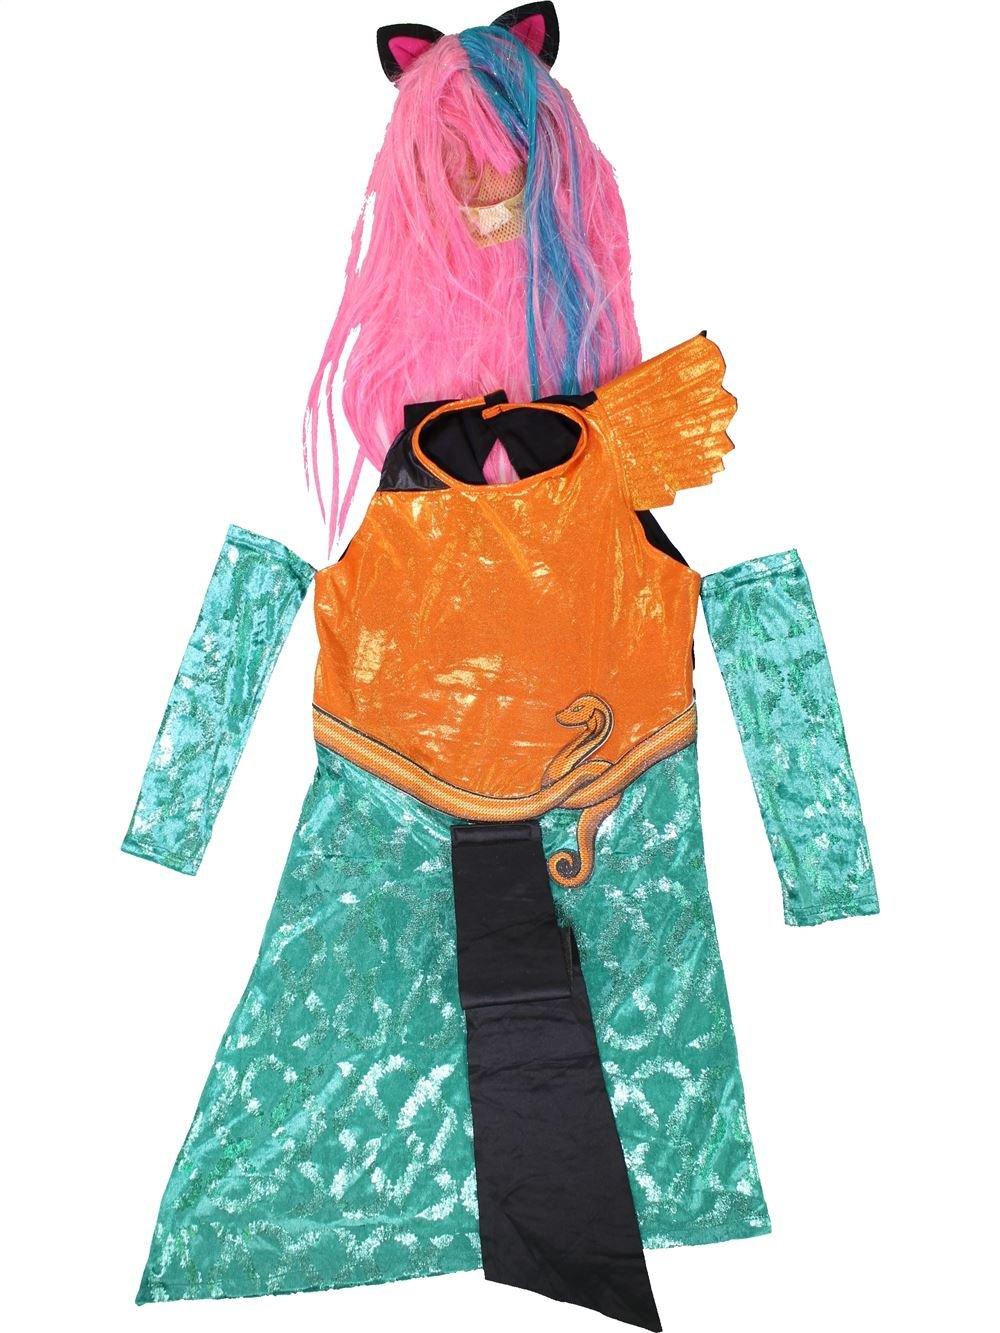 Déguisement Fille Monster High 10 Ans Pas Cher 699 1307301